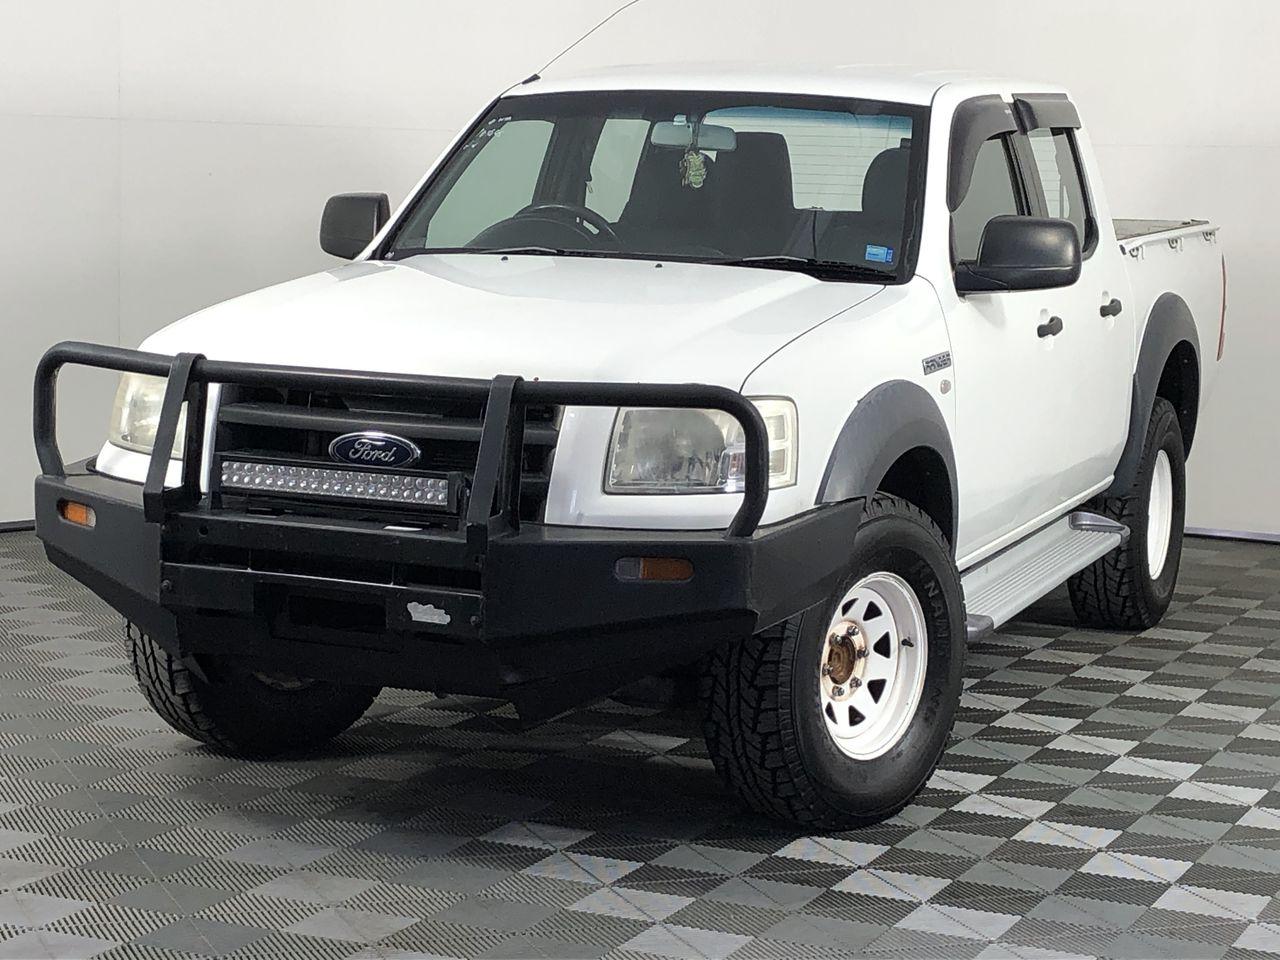 2007 Ford Ranger XL 4x2 Crew Cab PJ Turbo Diesel Automatic Dual Cab